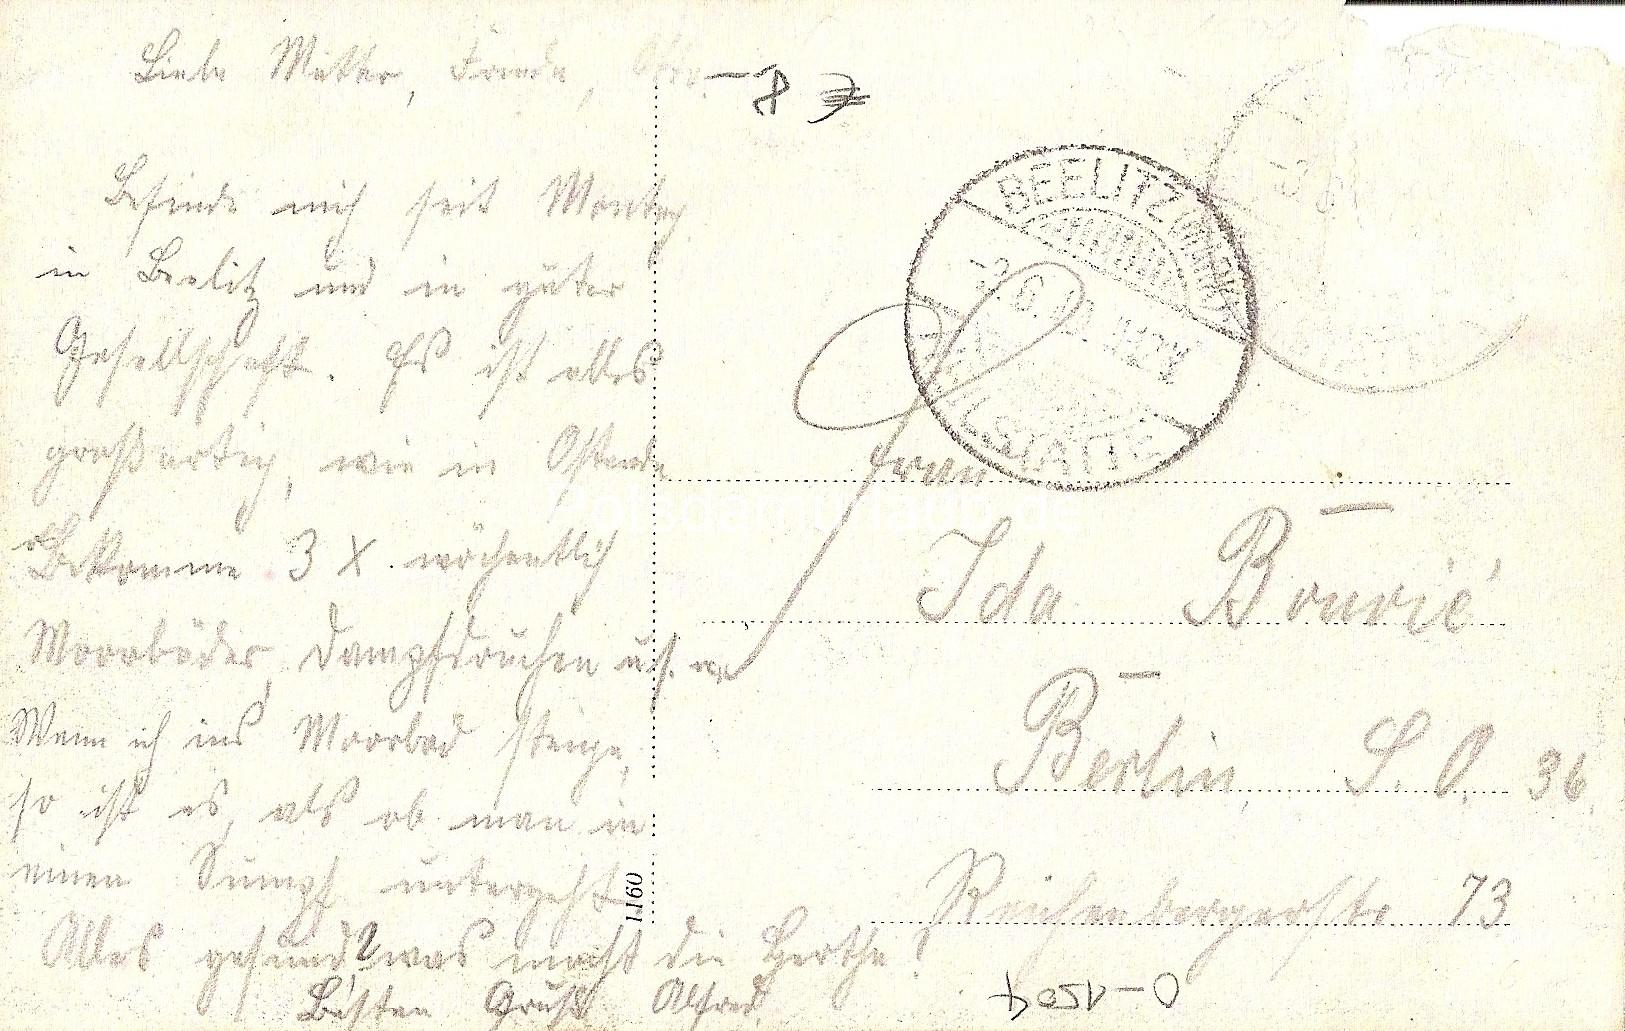 1910 06 03